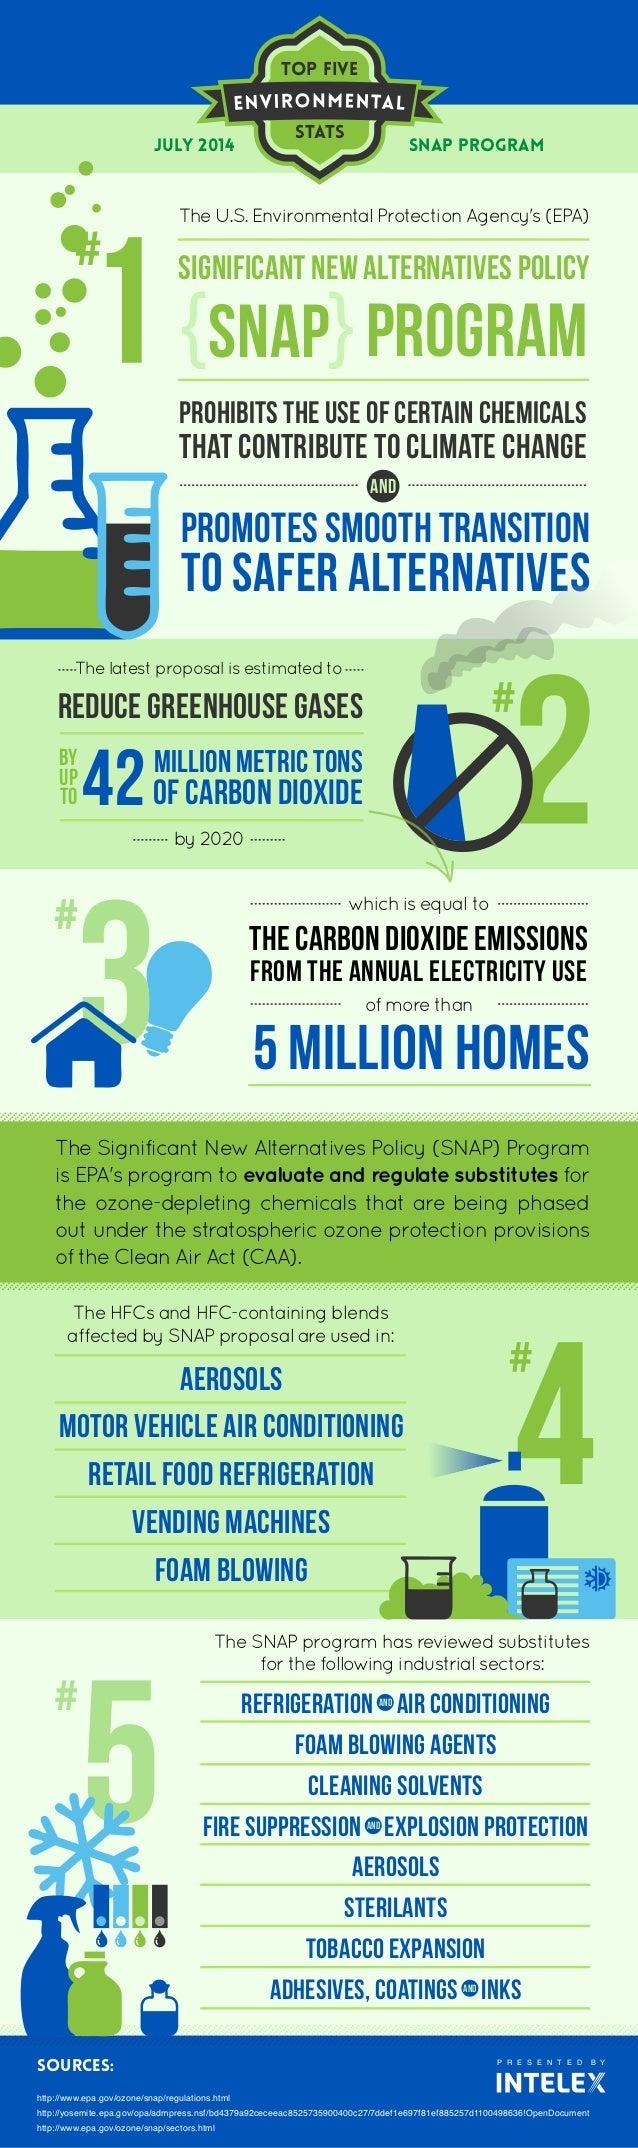 Intelex Top 5 Environmental Statistics – SNAP Program (Infographic)